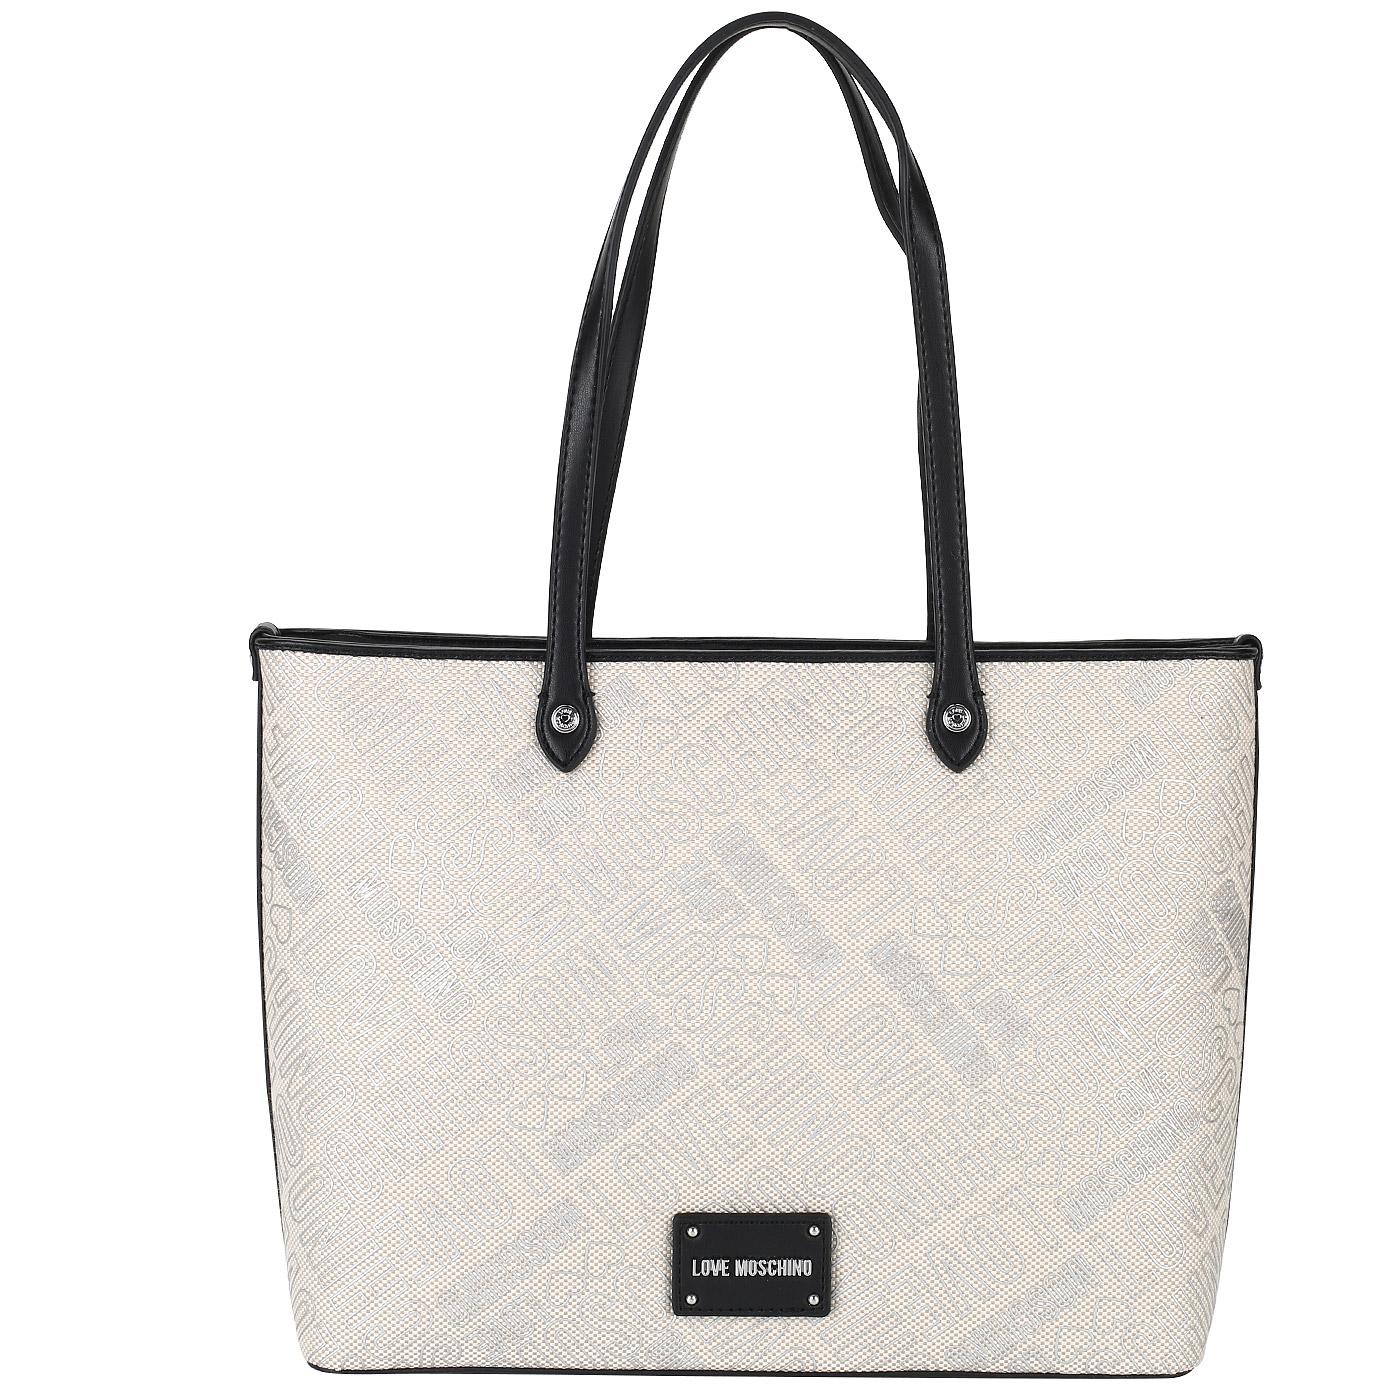 b6b302ef04a5 Вместительная женская сумка Love Moschino Embossed canvas Вместительная  женская сумка Love Moschino Embossed canvas ...